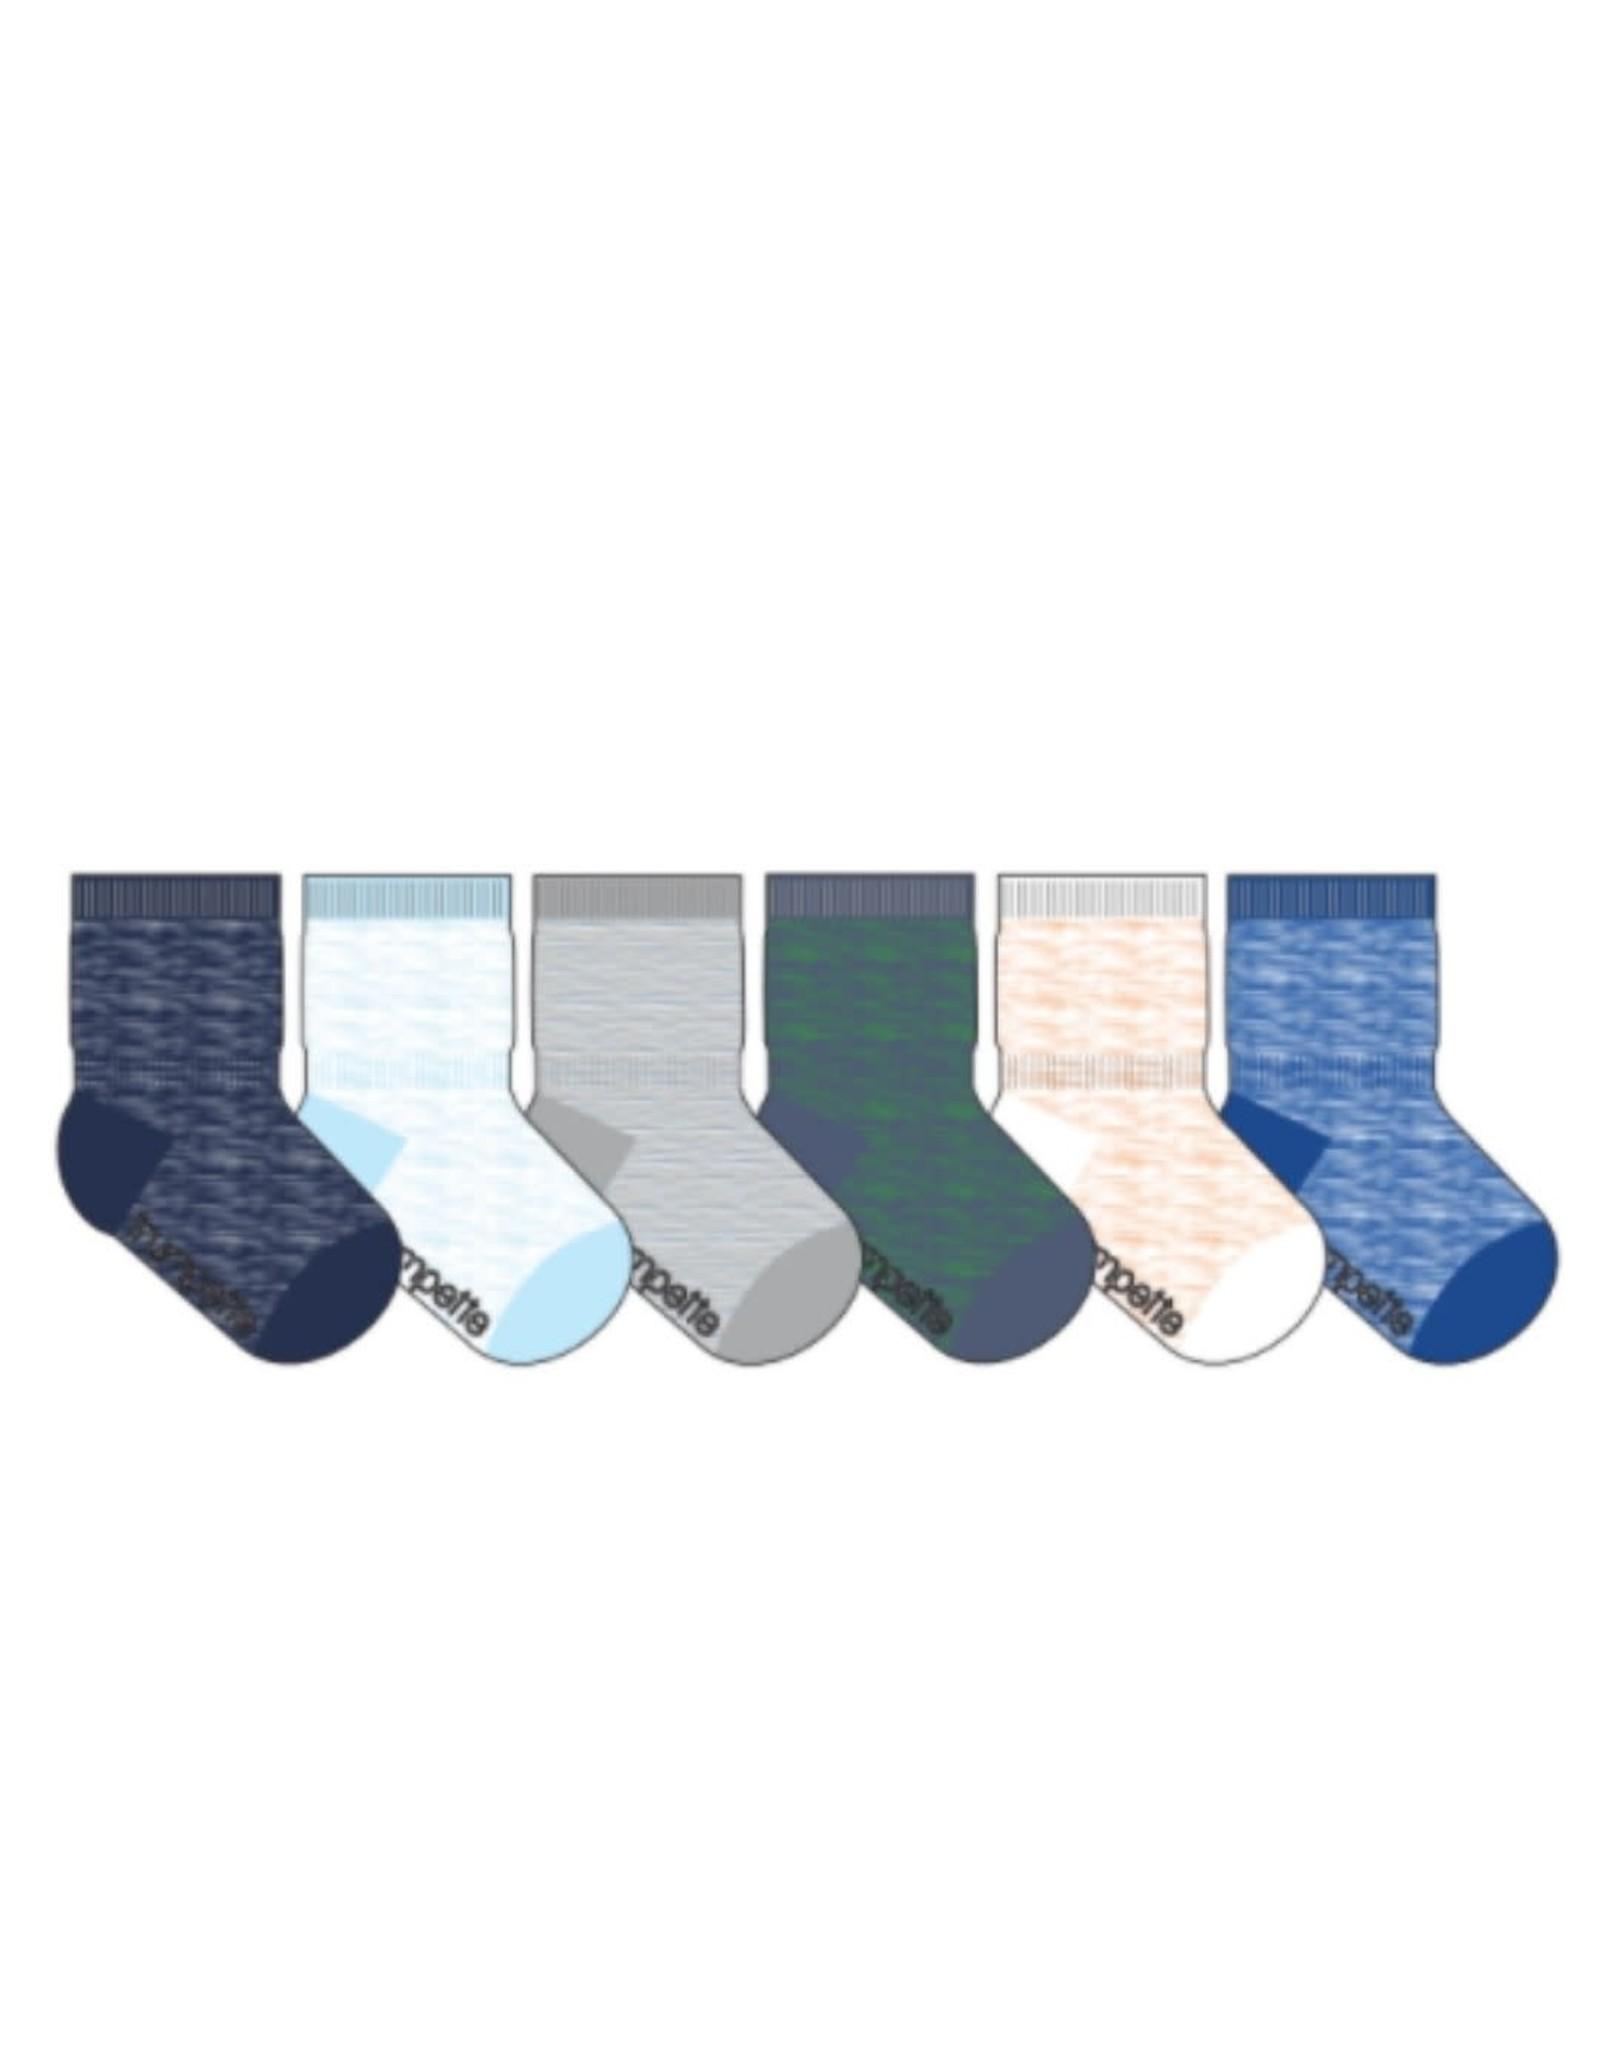 Trumpette Socks set of 6 - Casey Space Blue